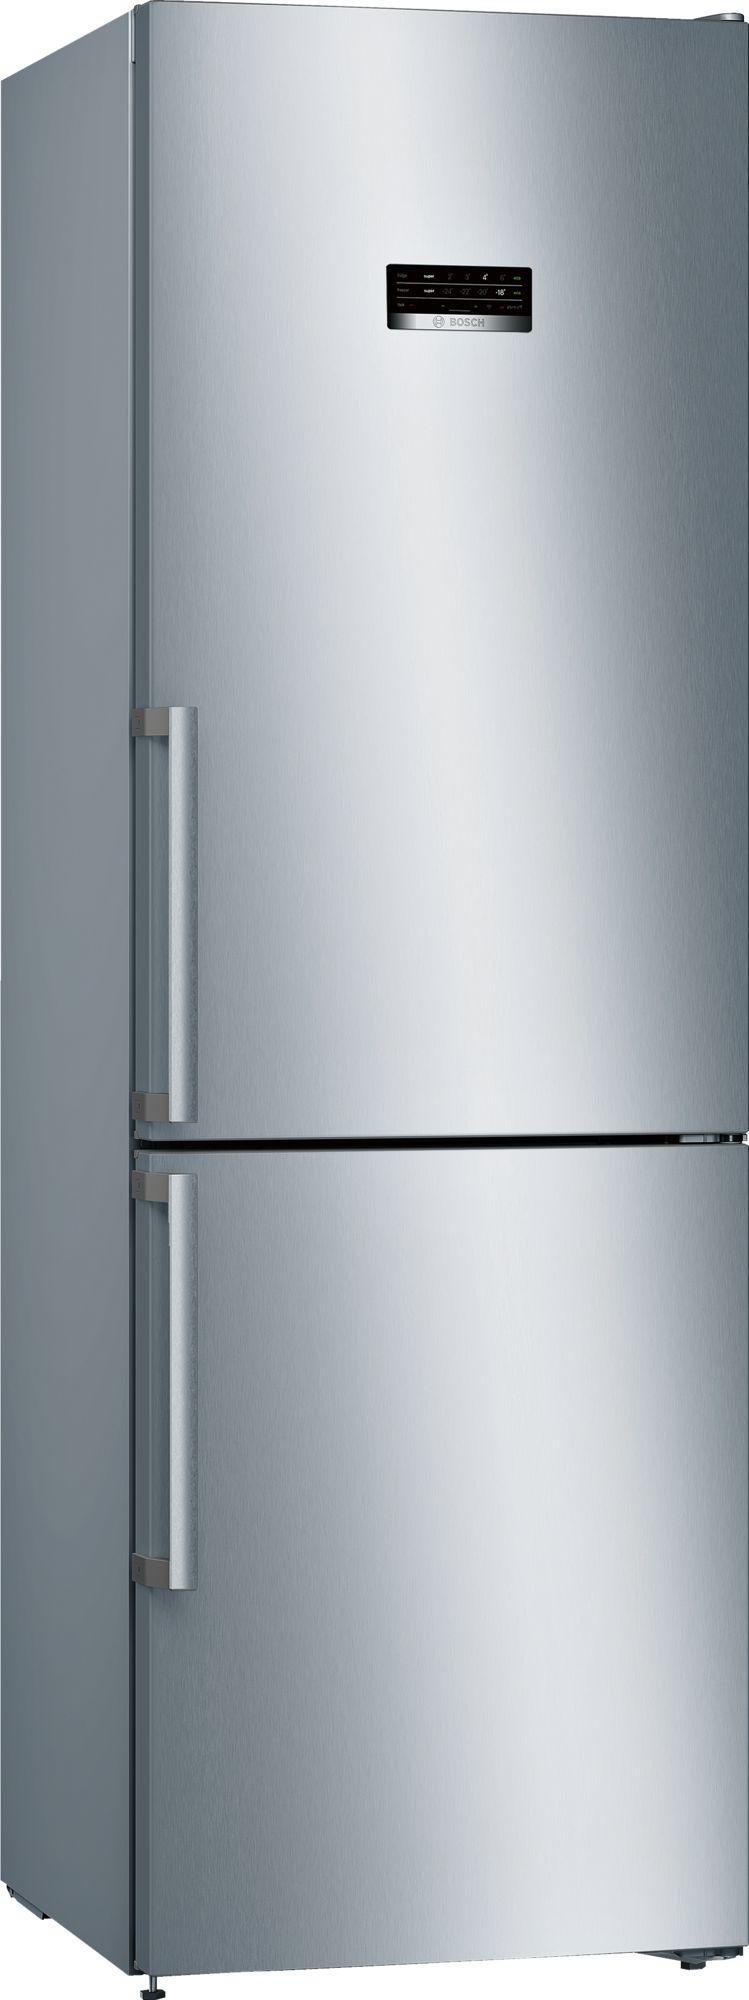 Image of Serie 4 KGN36XLER 60cm 324 Litre No Frost Fridge Freezer | Silver Innox